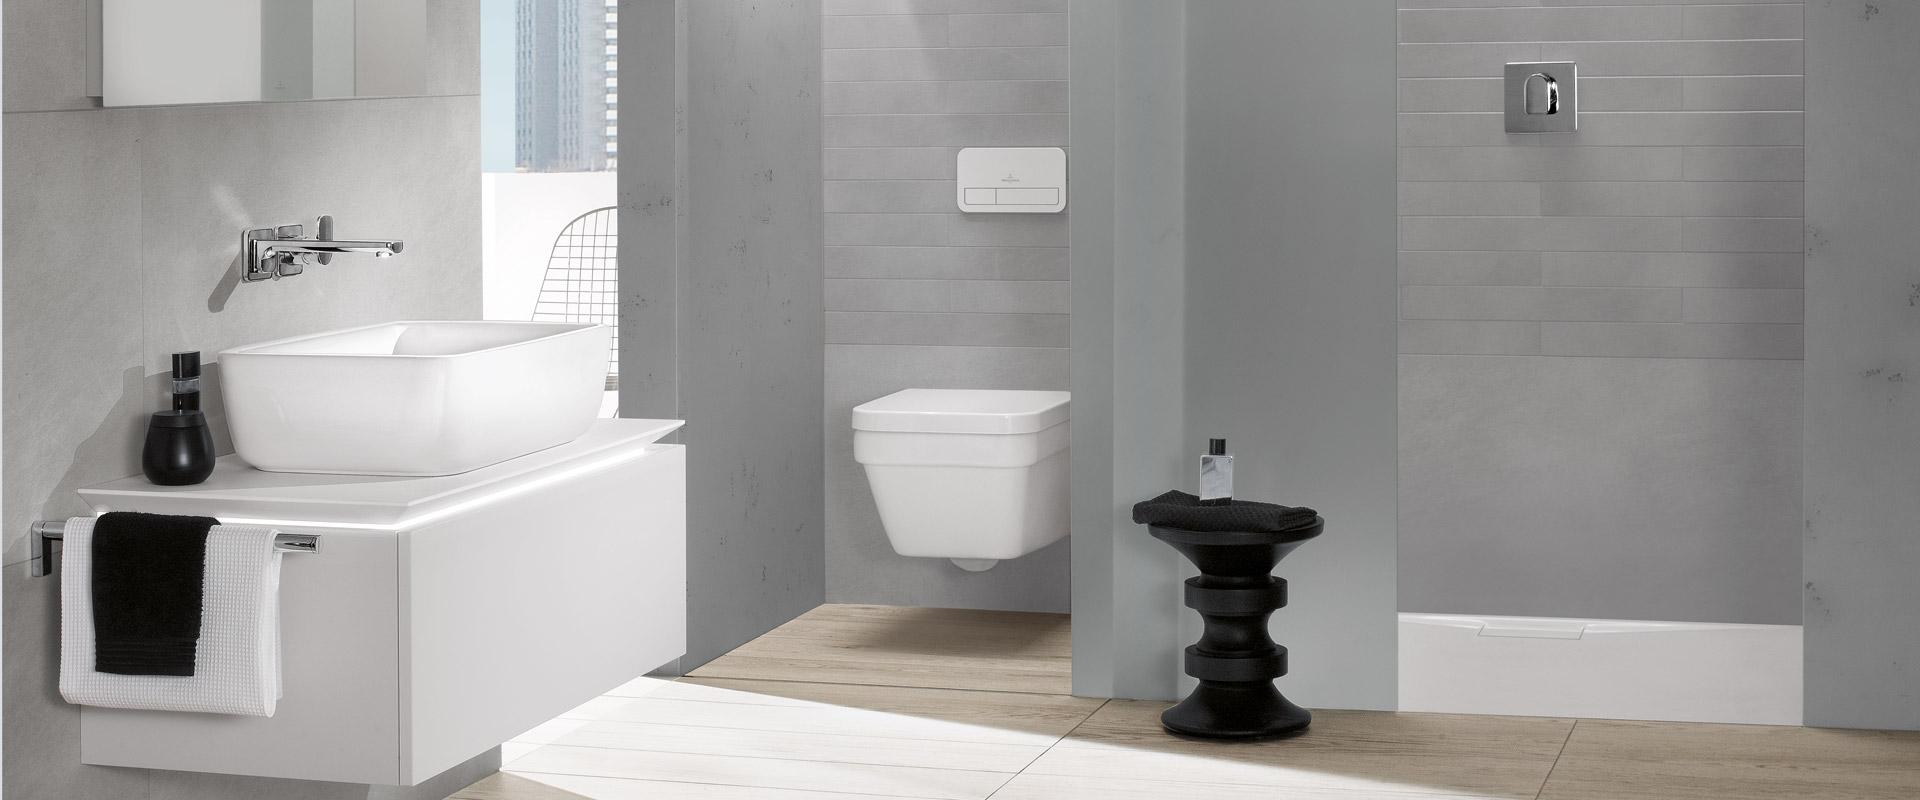 Architectura collection timeless design villeroy boch for Bathroom planner villeroy